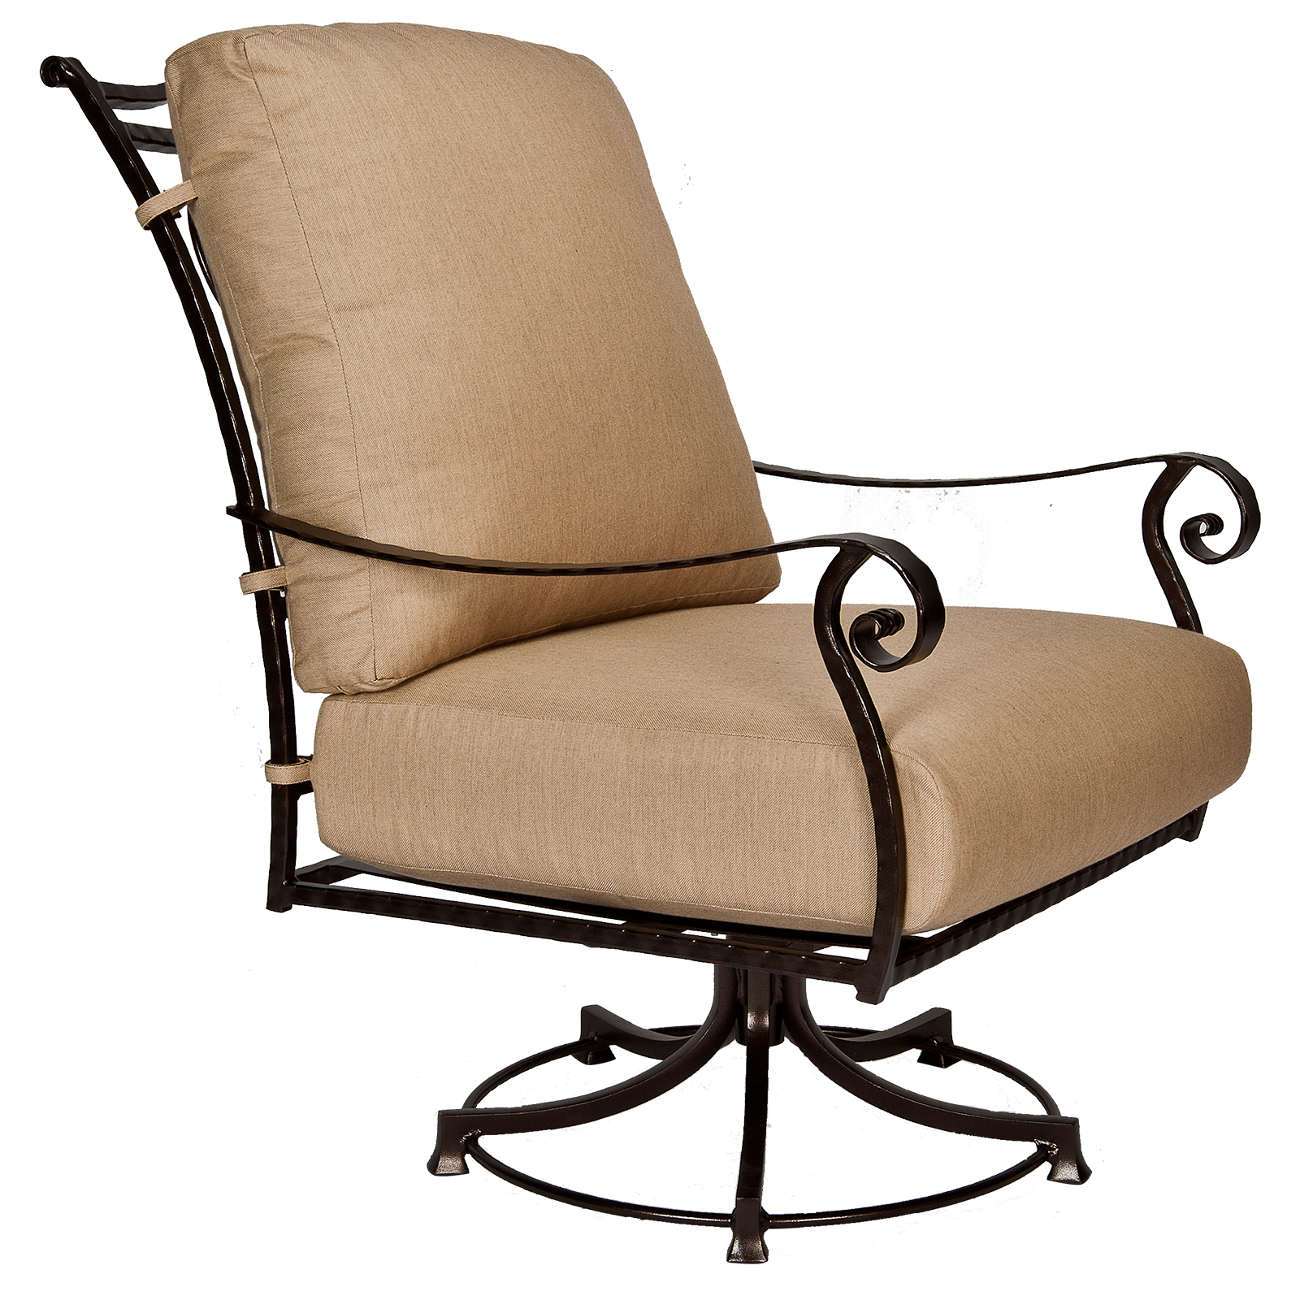 San Cristobal Swivel Rocker Lounge Chair | Outdoor Furniture Pertaining To Orange Rocking Chairs Lounge Chairs (View 18 of 20)